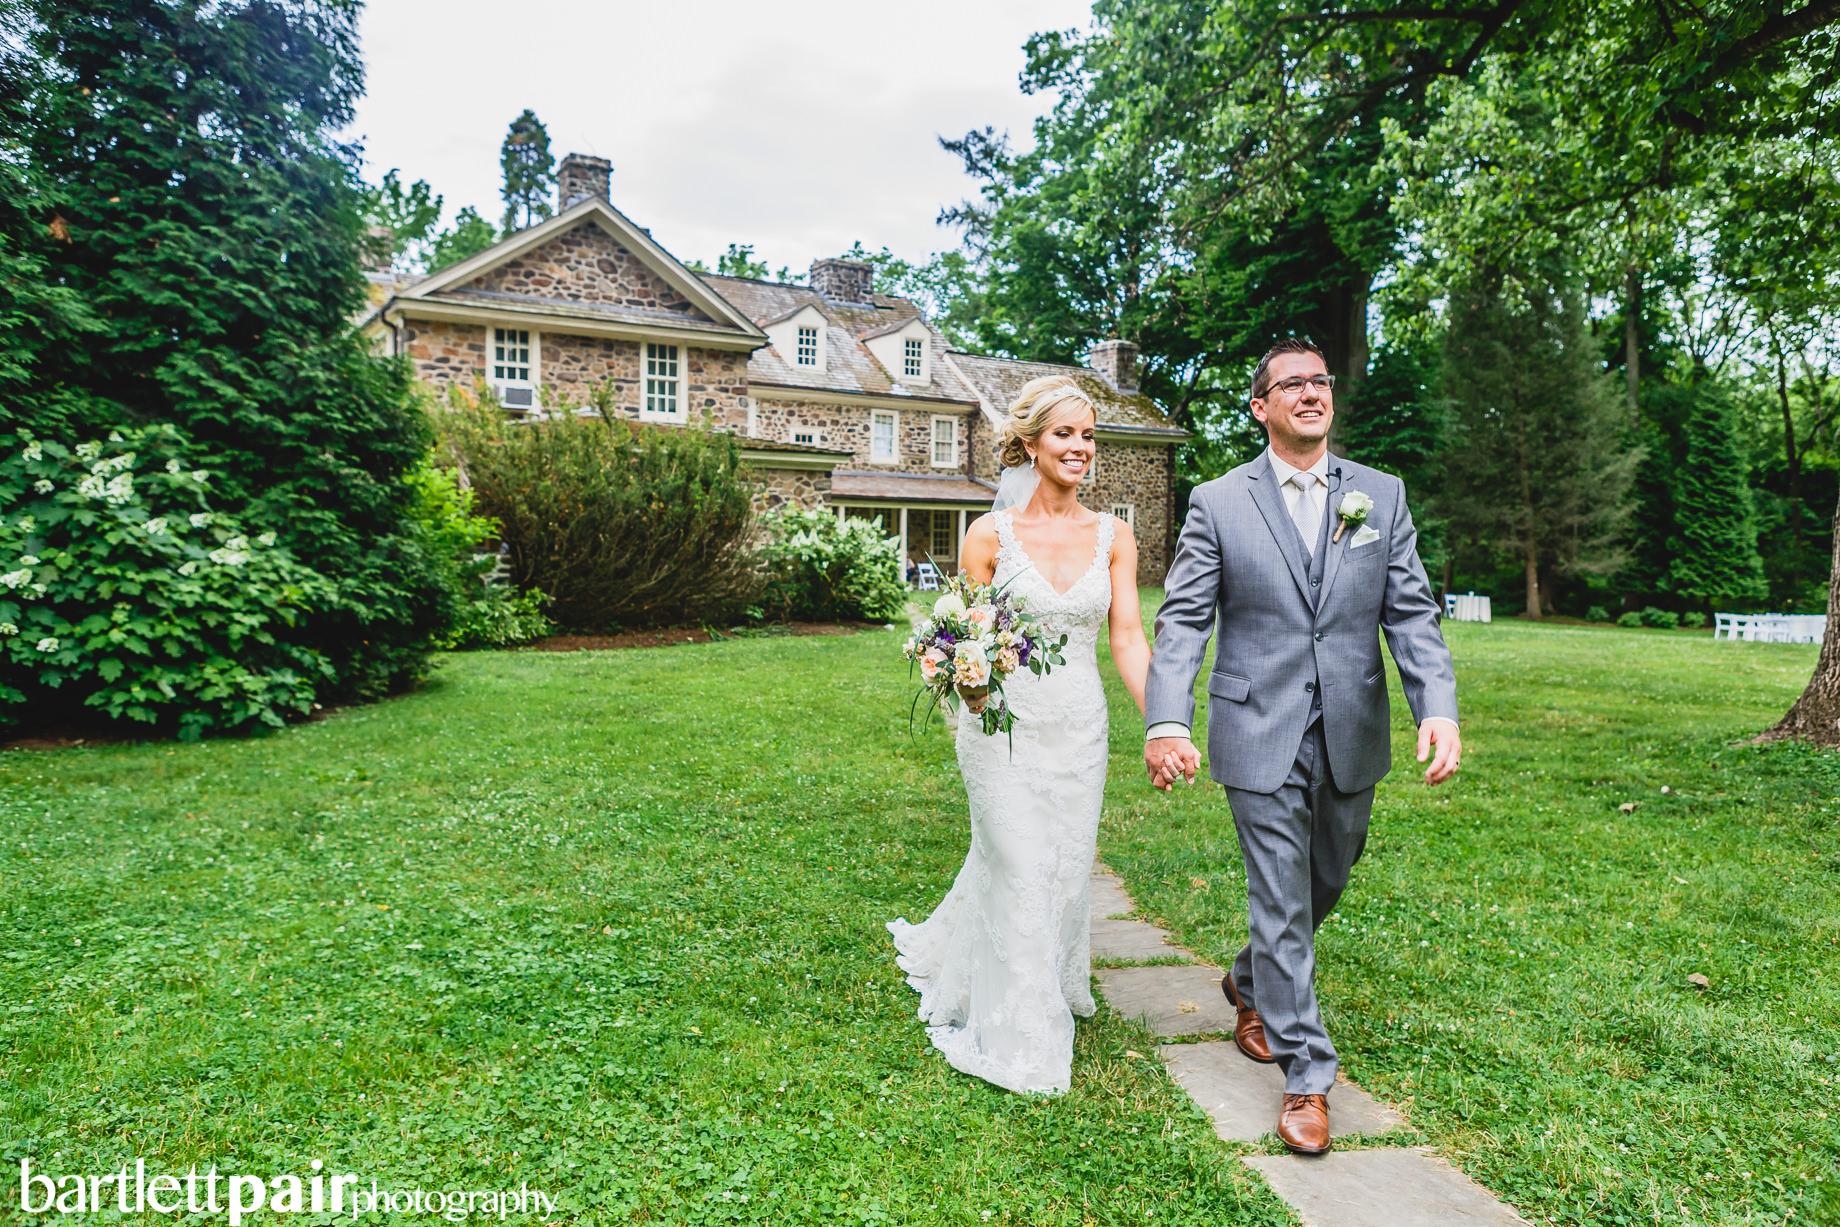 9 Gorgeous Rustic Wedding Venues in Philadelphia - Rustic Bride